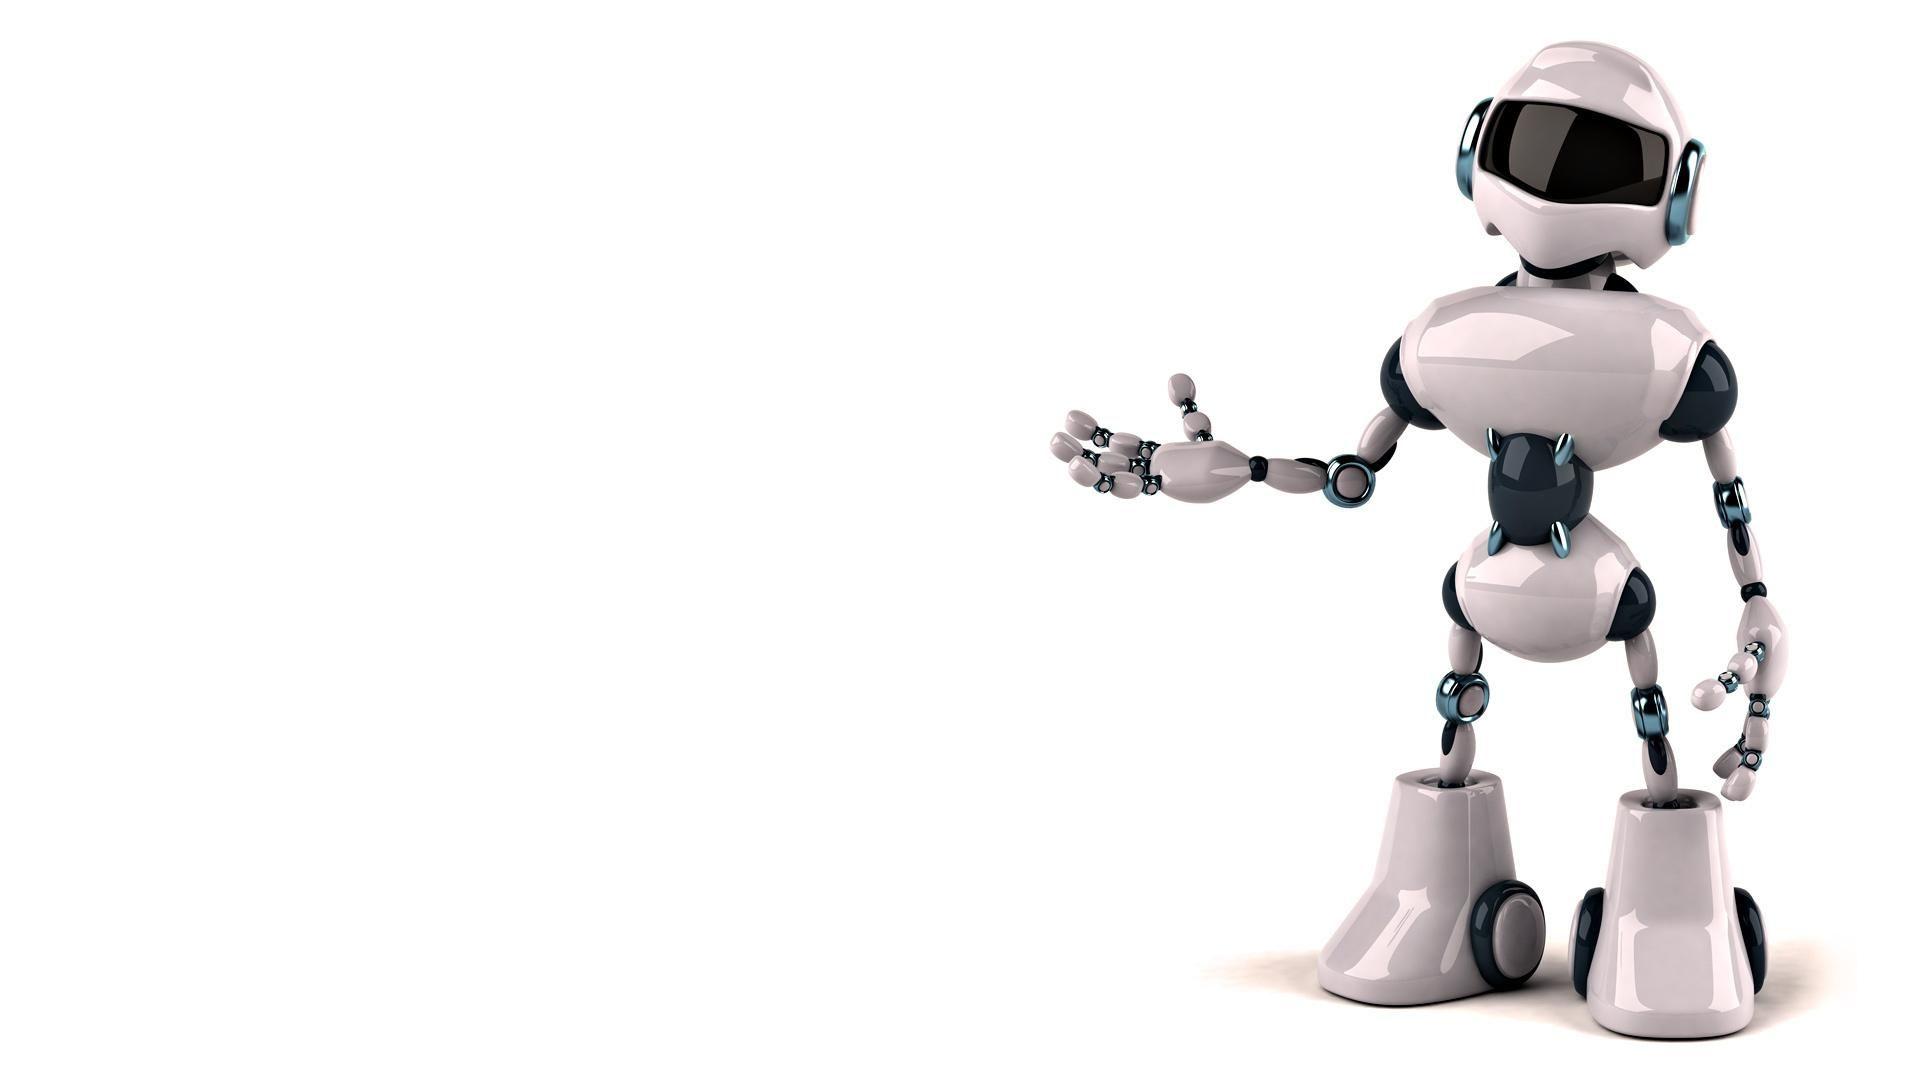 робот - Поиск в Google (с изображениями) | Синие картинки ...